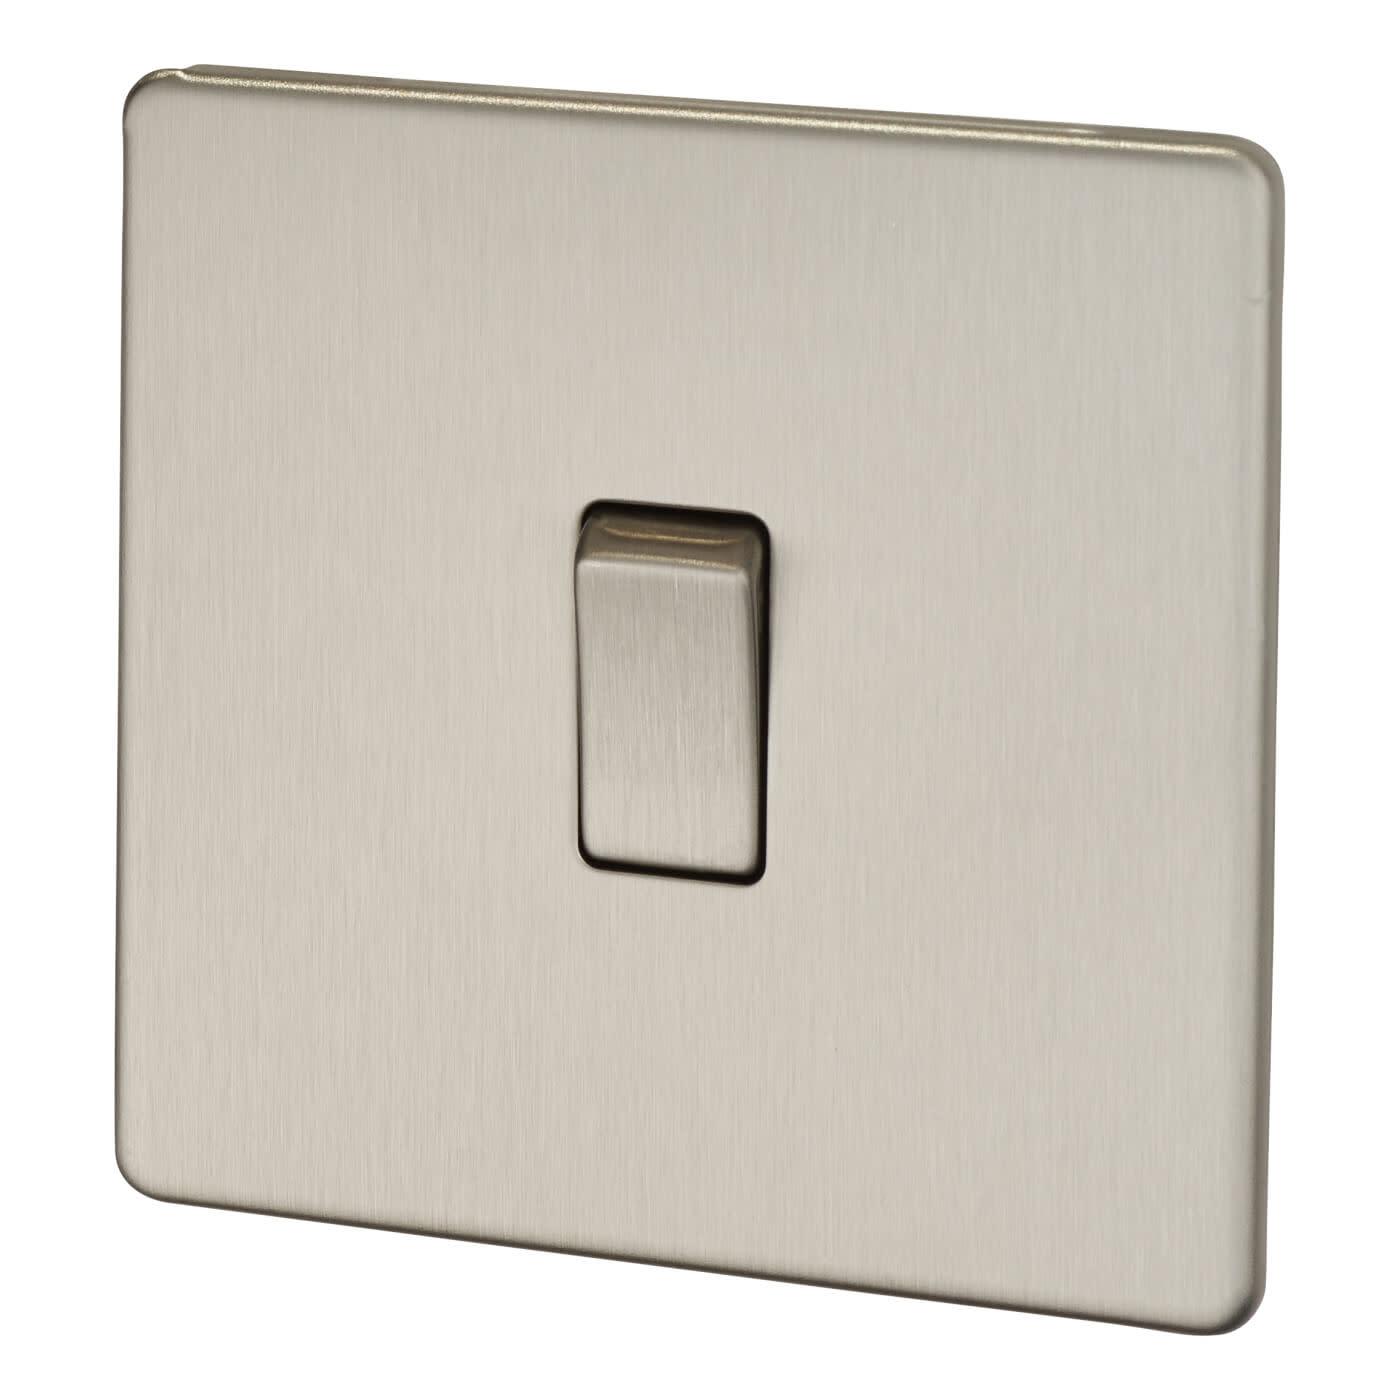 BG 10A Screwless Flatplate Intermediate Switch - Brushed Steel)